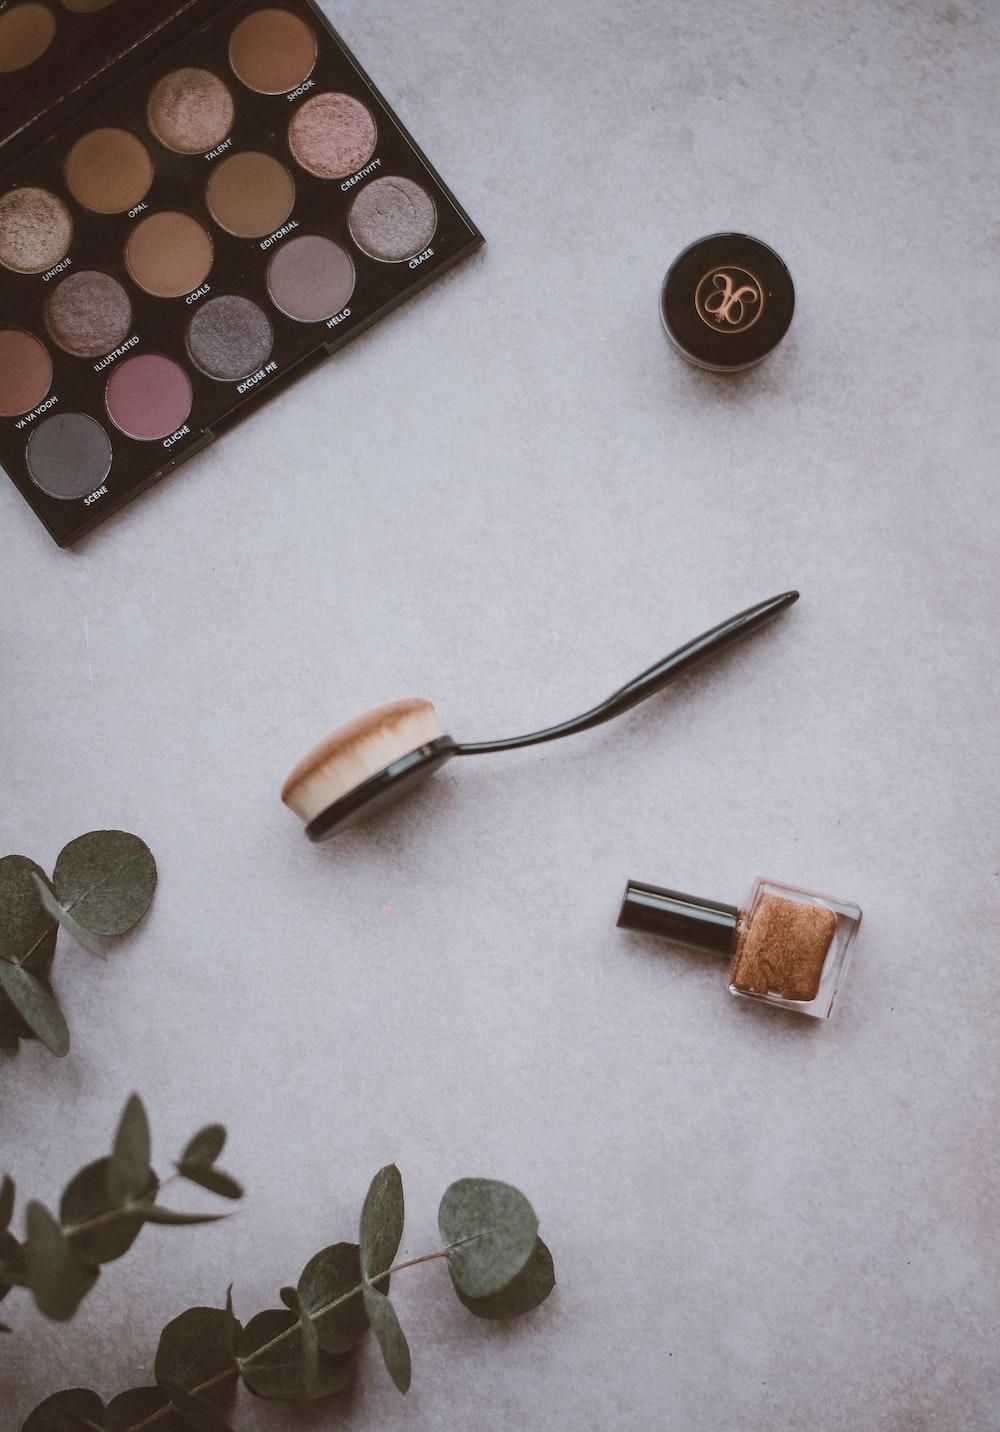 spoon make up brush near eyeshadow palette